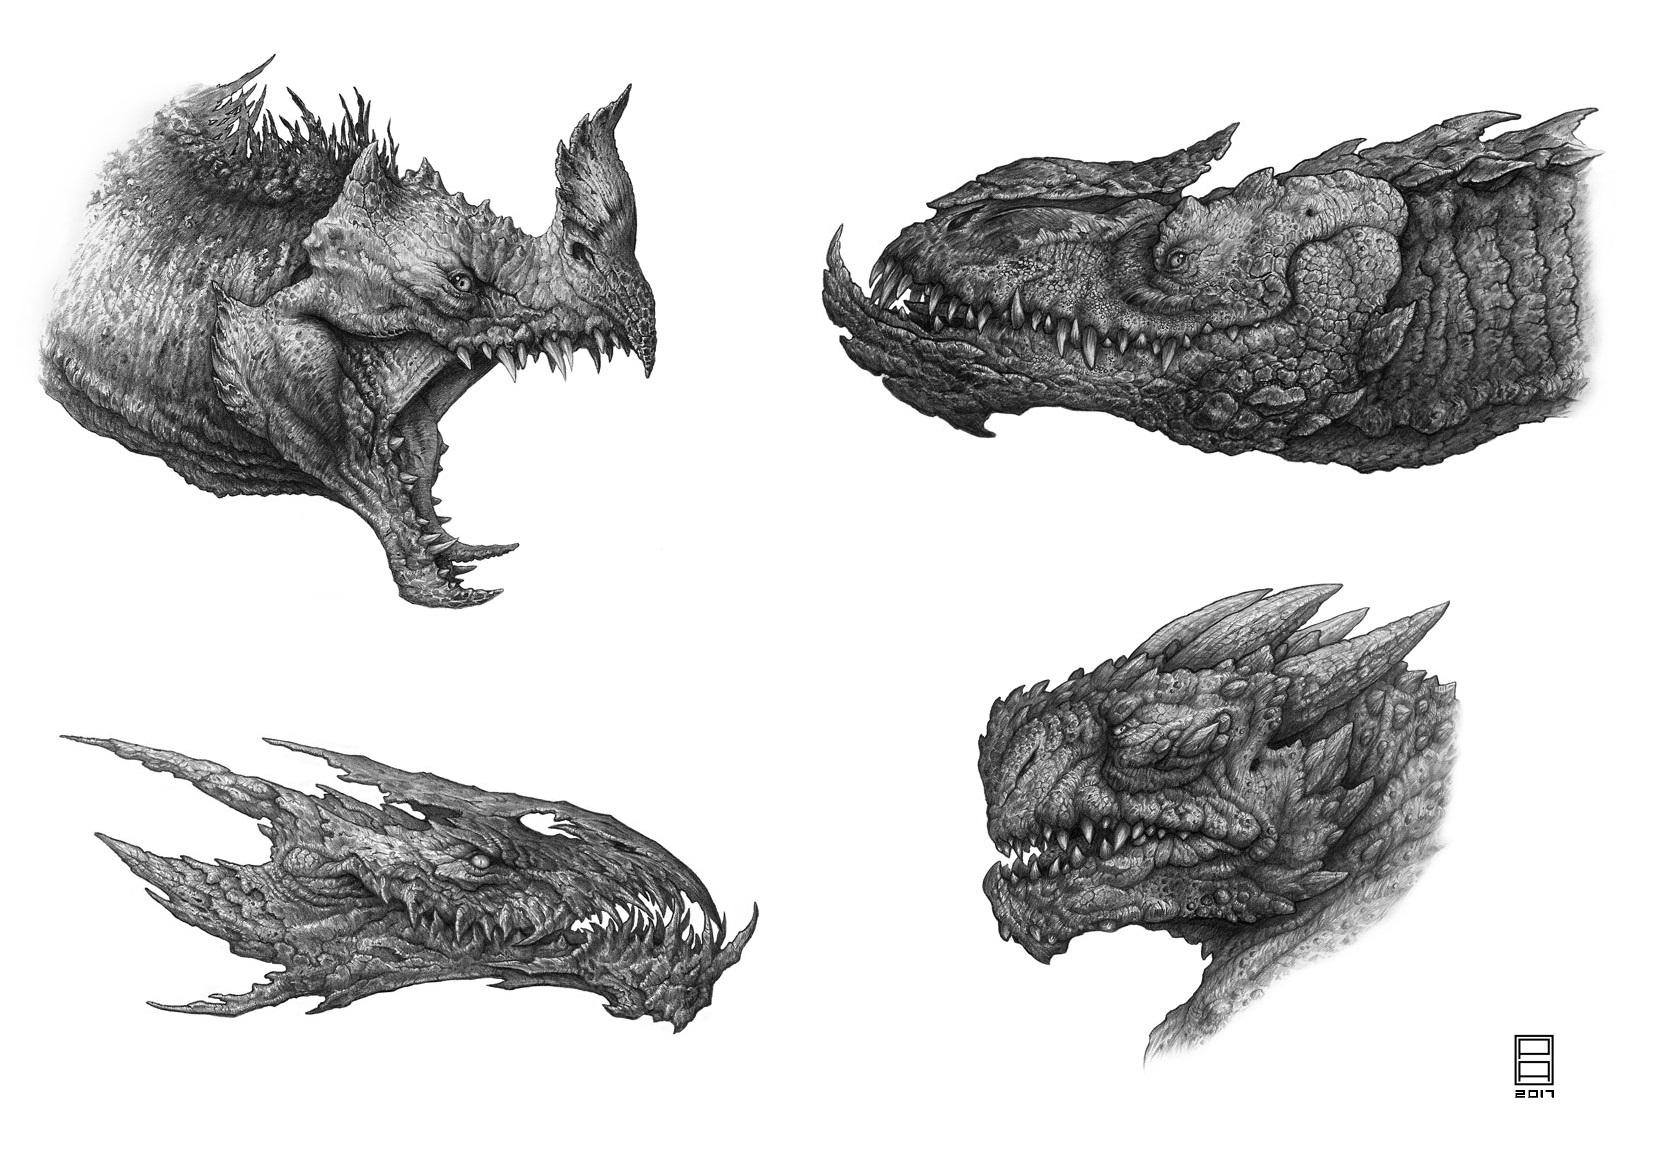 dragon head study pencil 1 by deepcore1 on deviantart